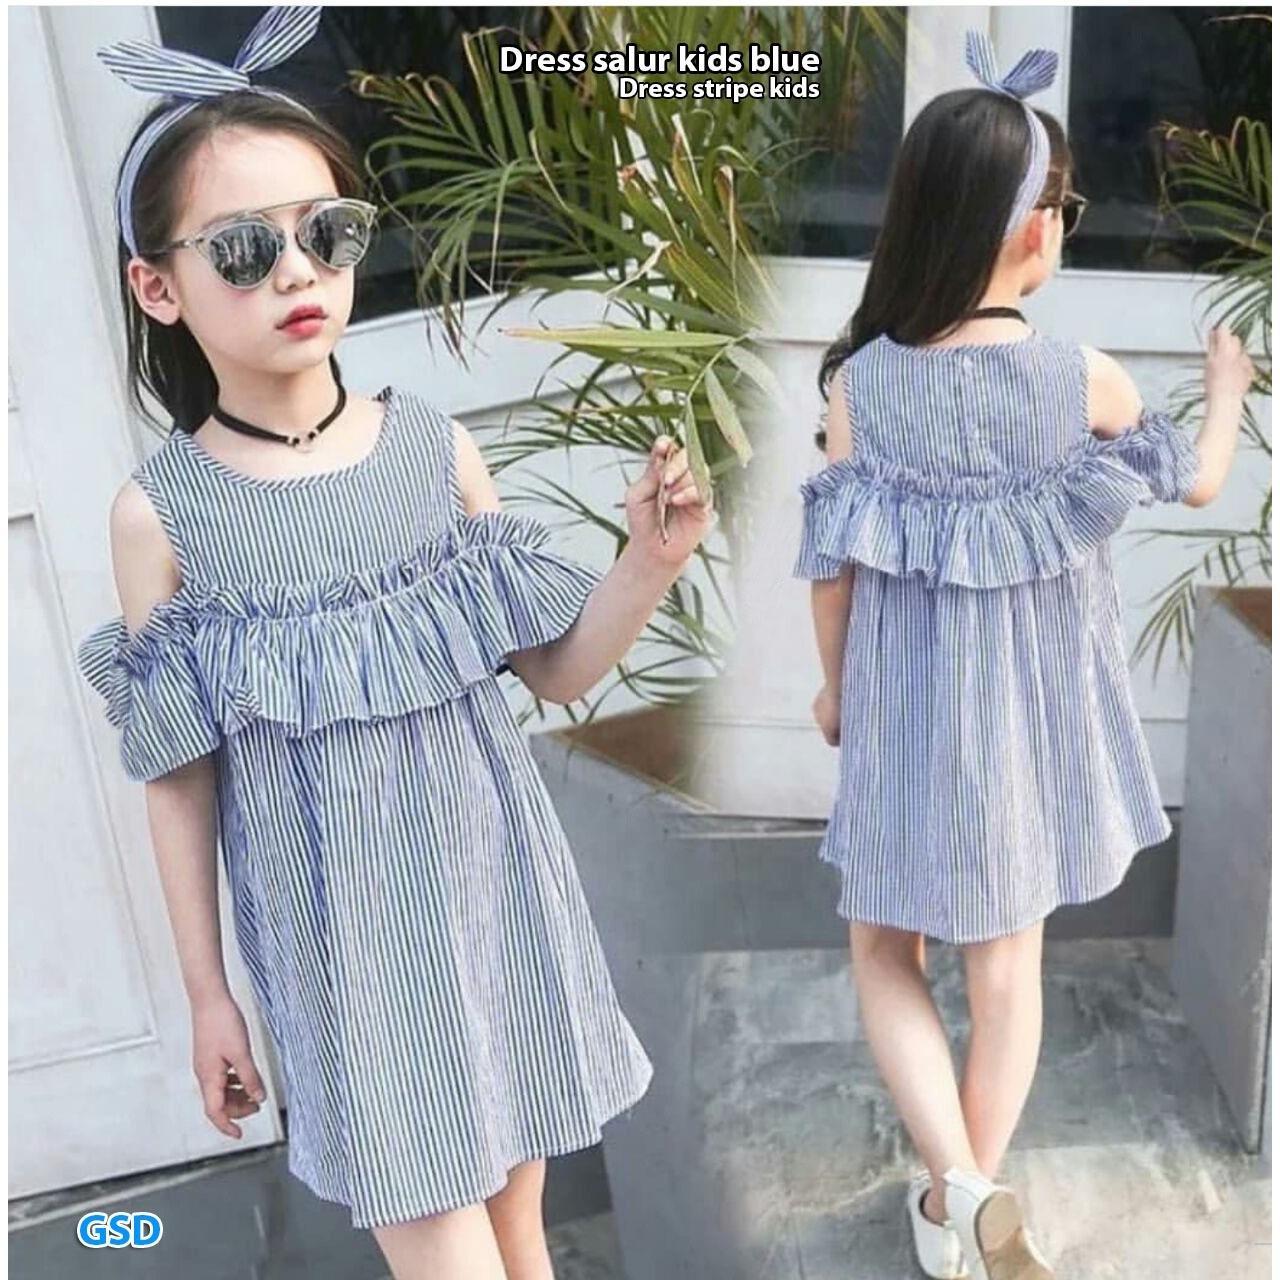 GSD Baju Anak / Baju Anak Cewek / Dress Anak / Baju Pesta Anak / Dress